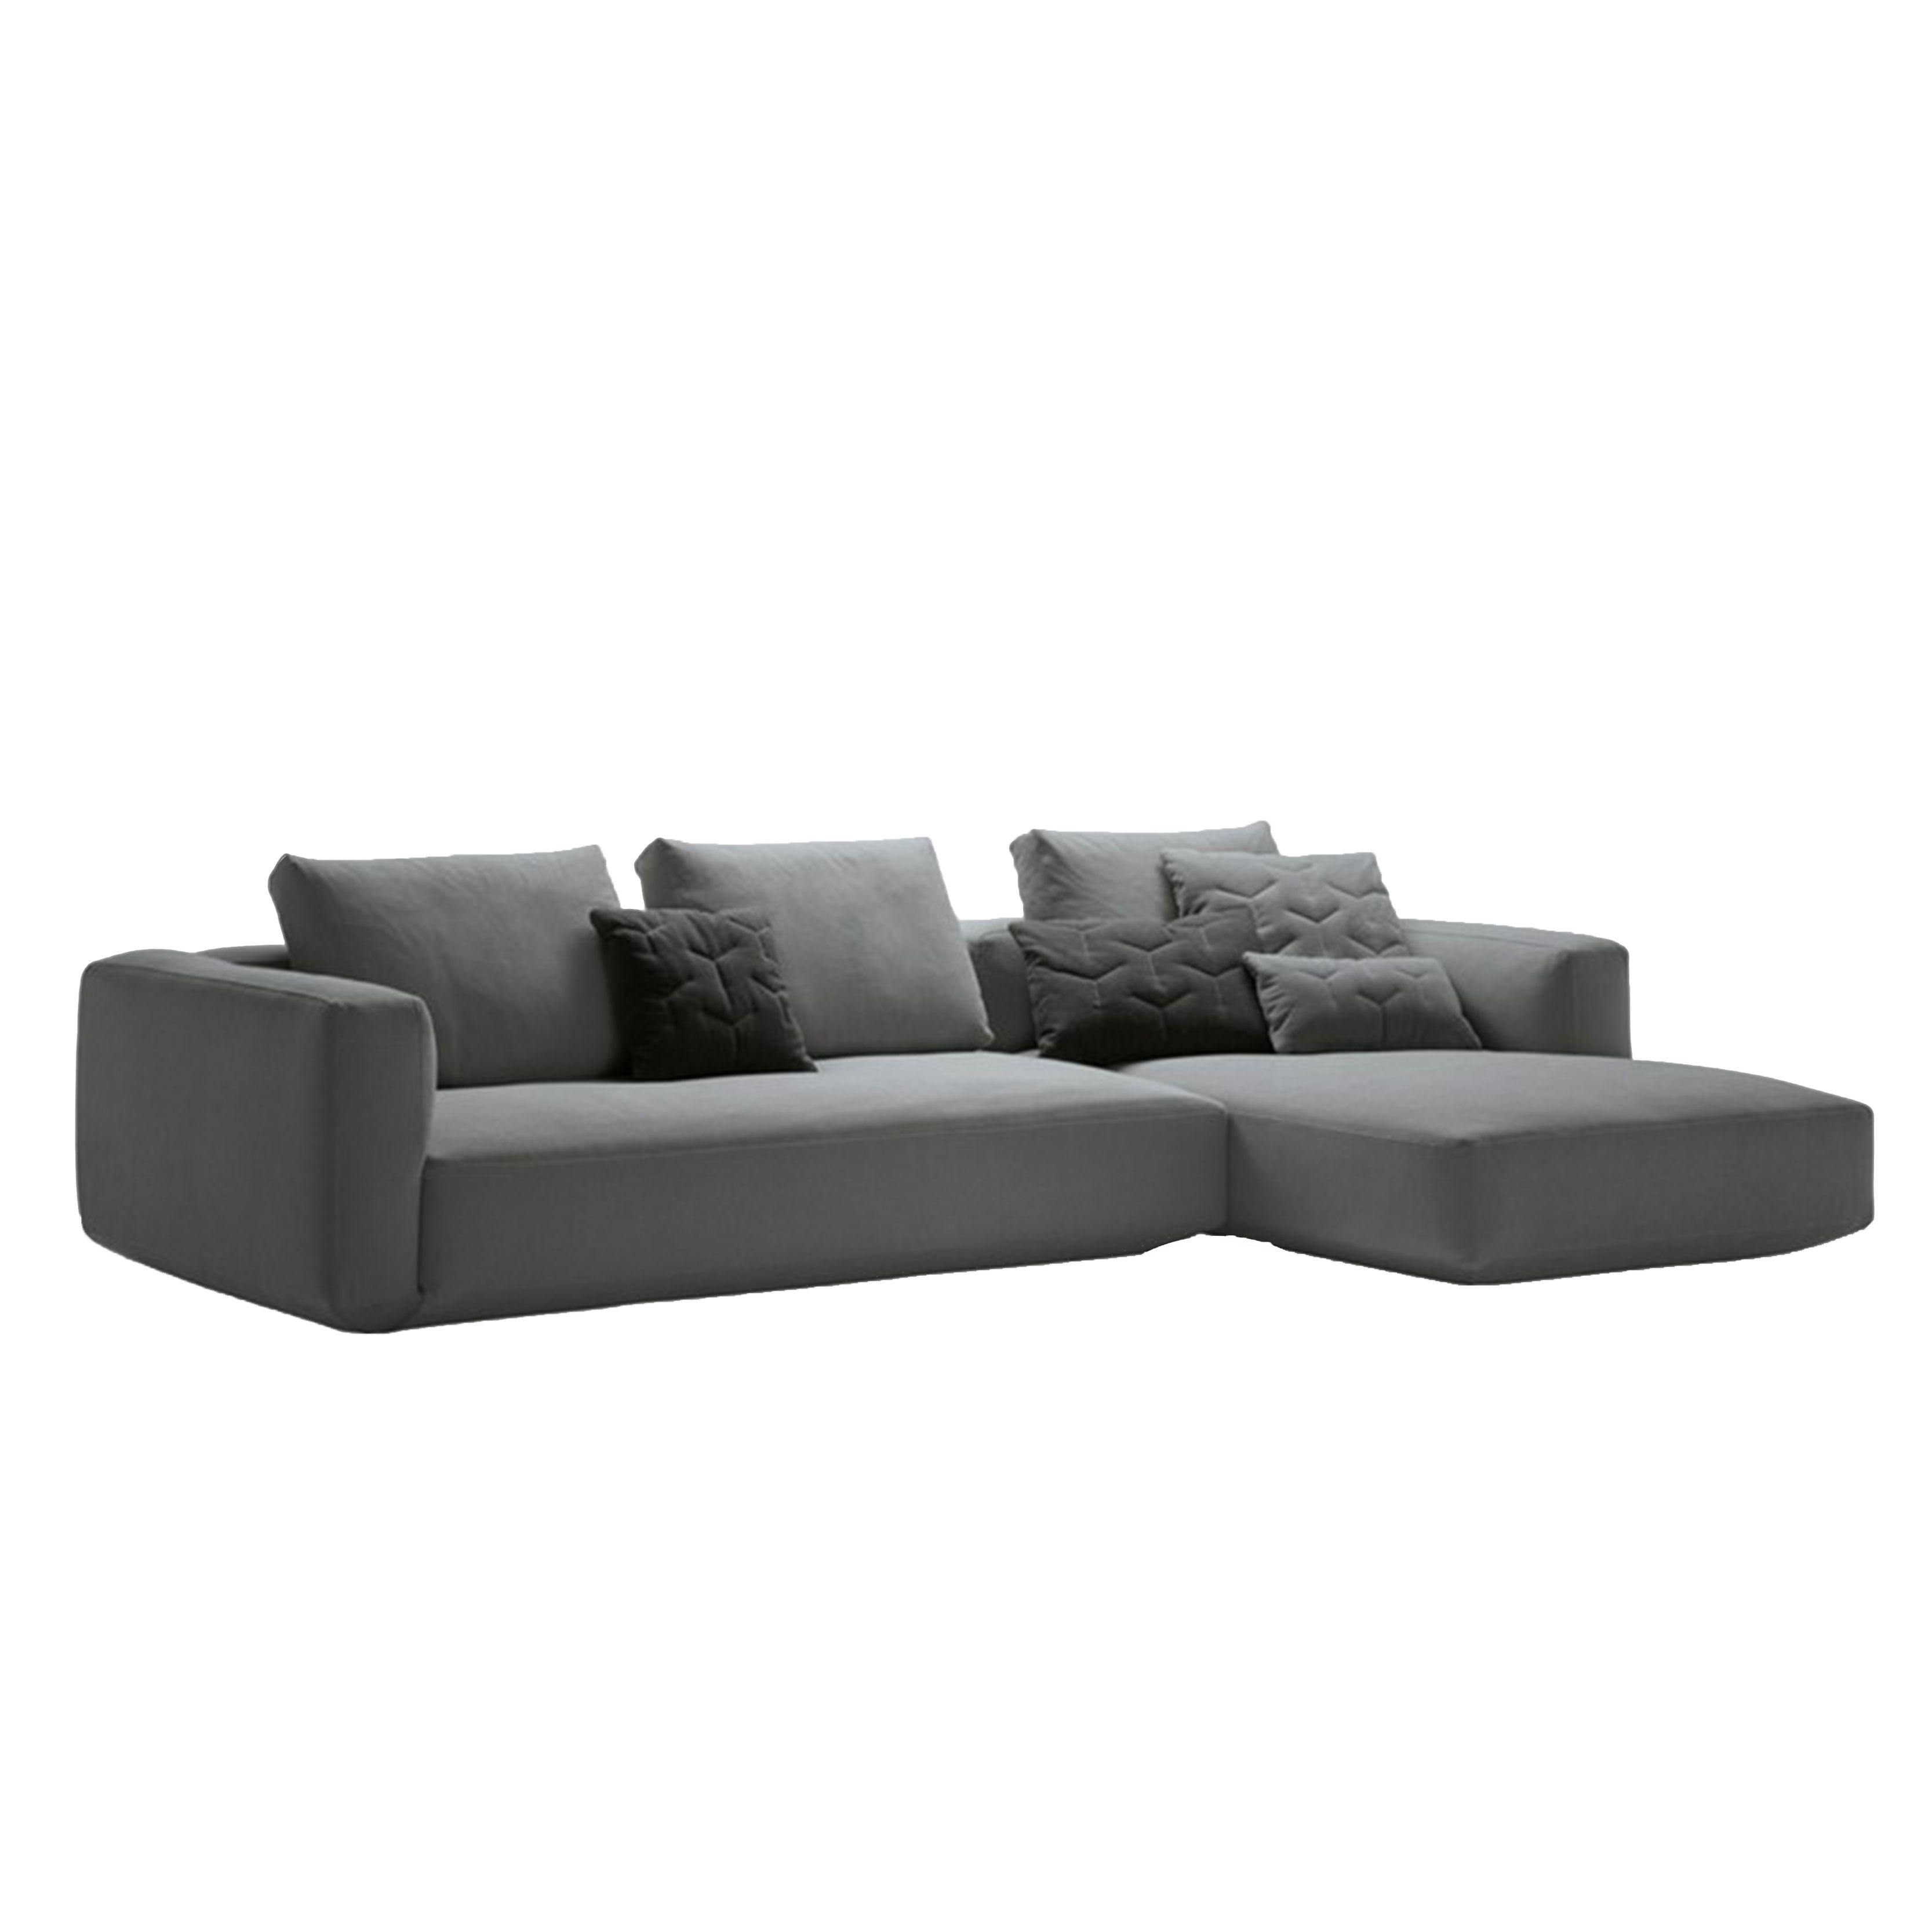 Luxury And Premium Italian Furniture Brands In India Premium And Luxury Italian Furniture Italian Furniture Brands Luxury Italian Furniture Italian Furniture